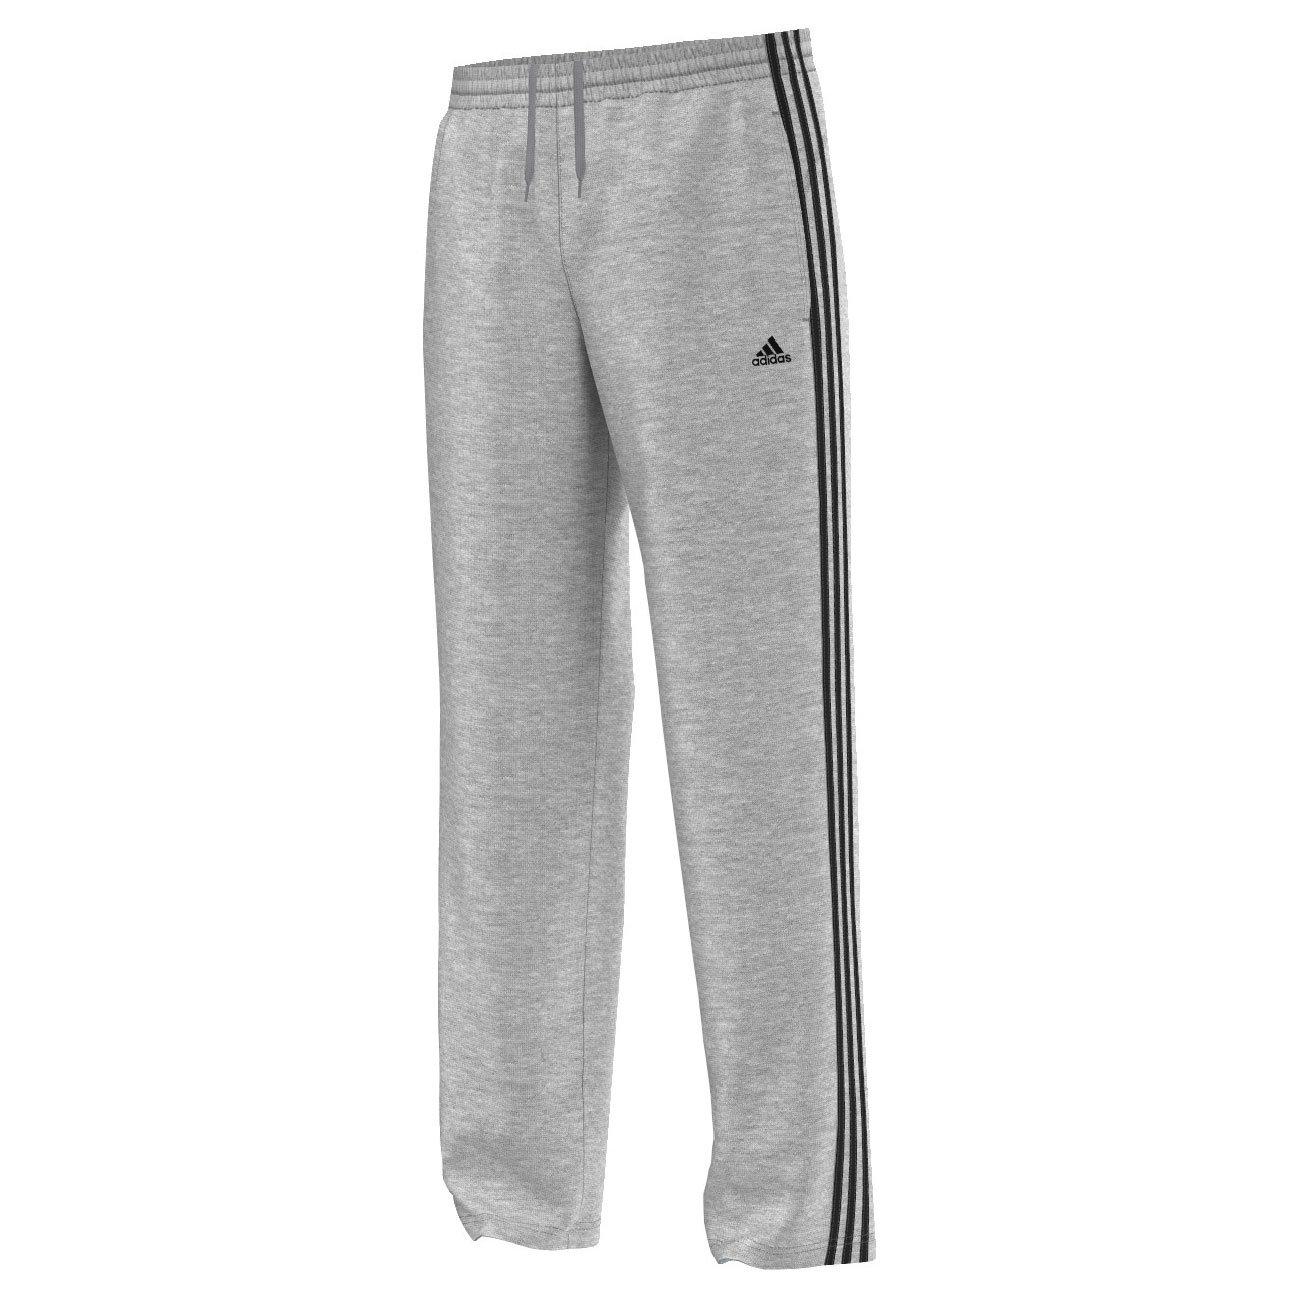 adidas Herren Hose Essentials 3 Stripes Light Sweatpants